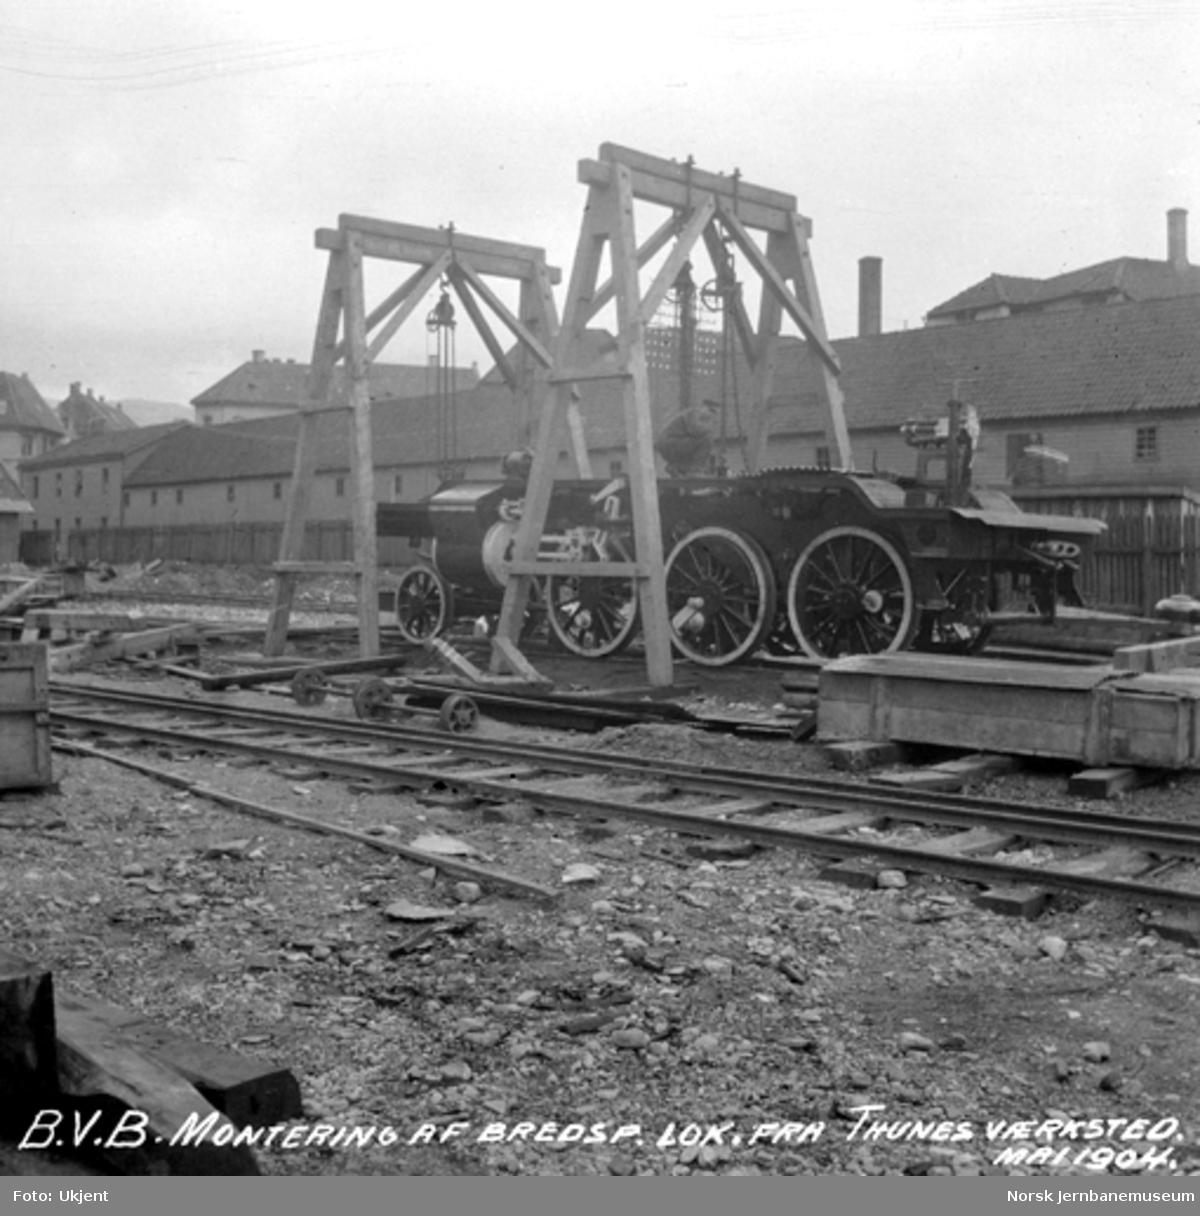 Normalspormateriell til Bergensbanen : ramme til damplokomotiv type 21a heises ned på hjulene